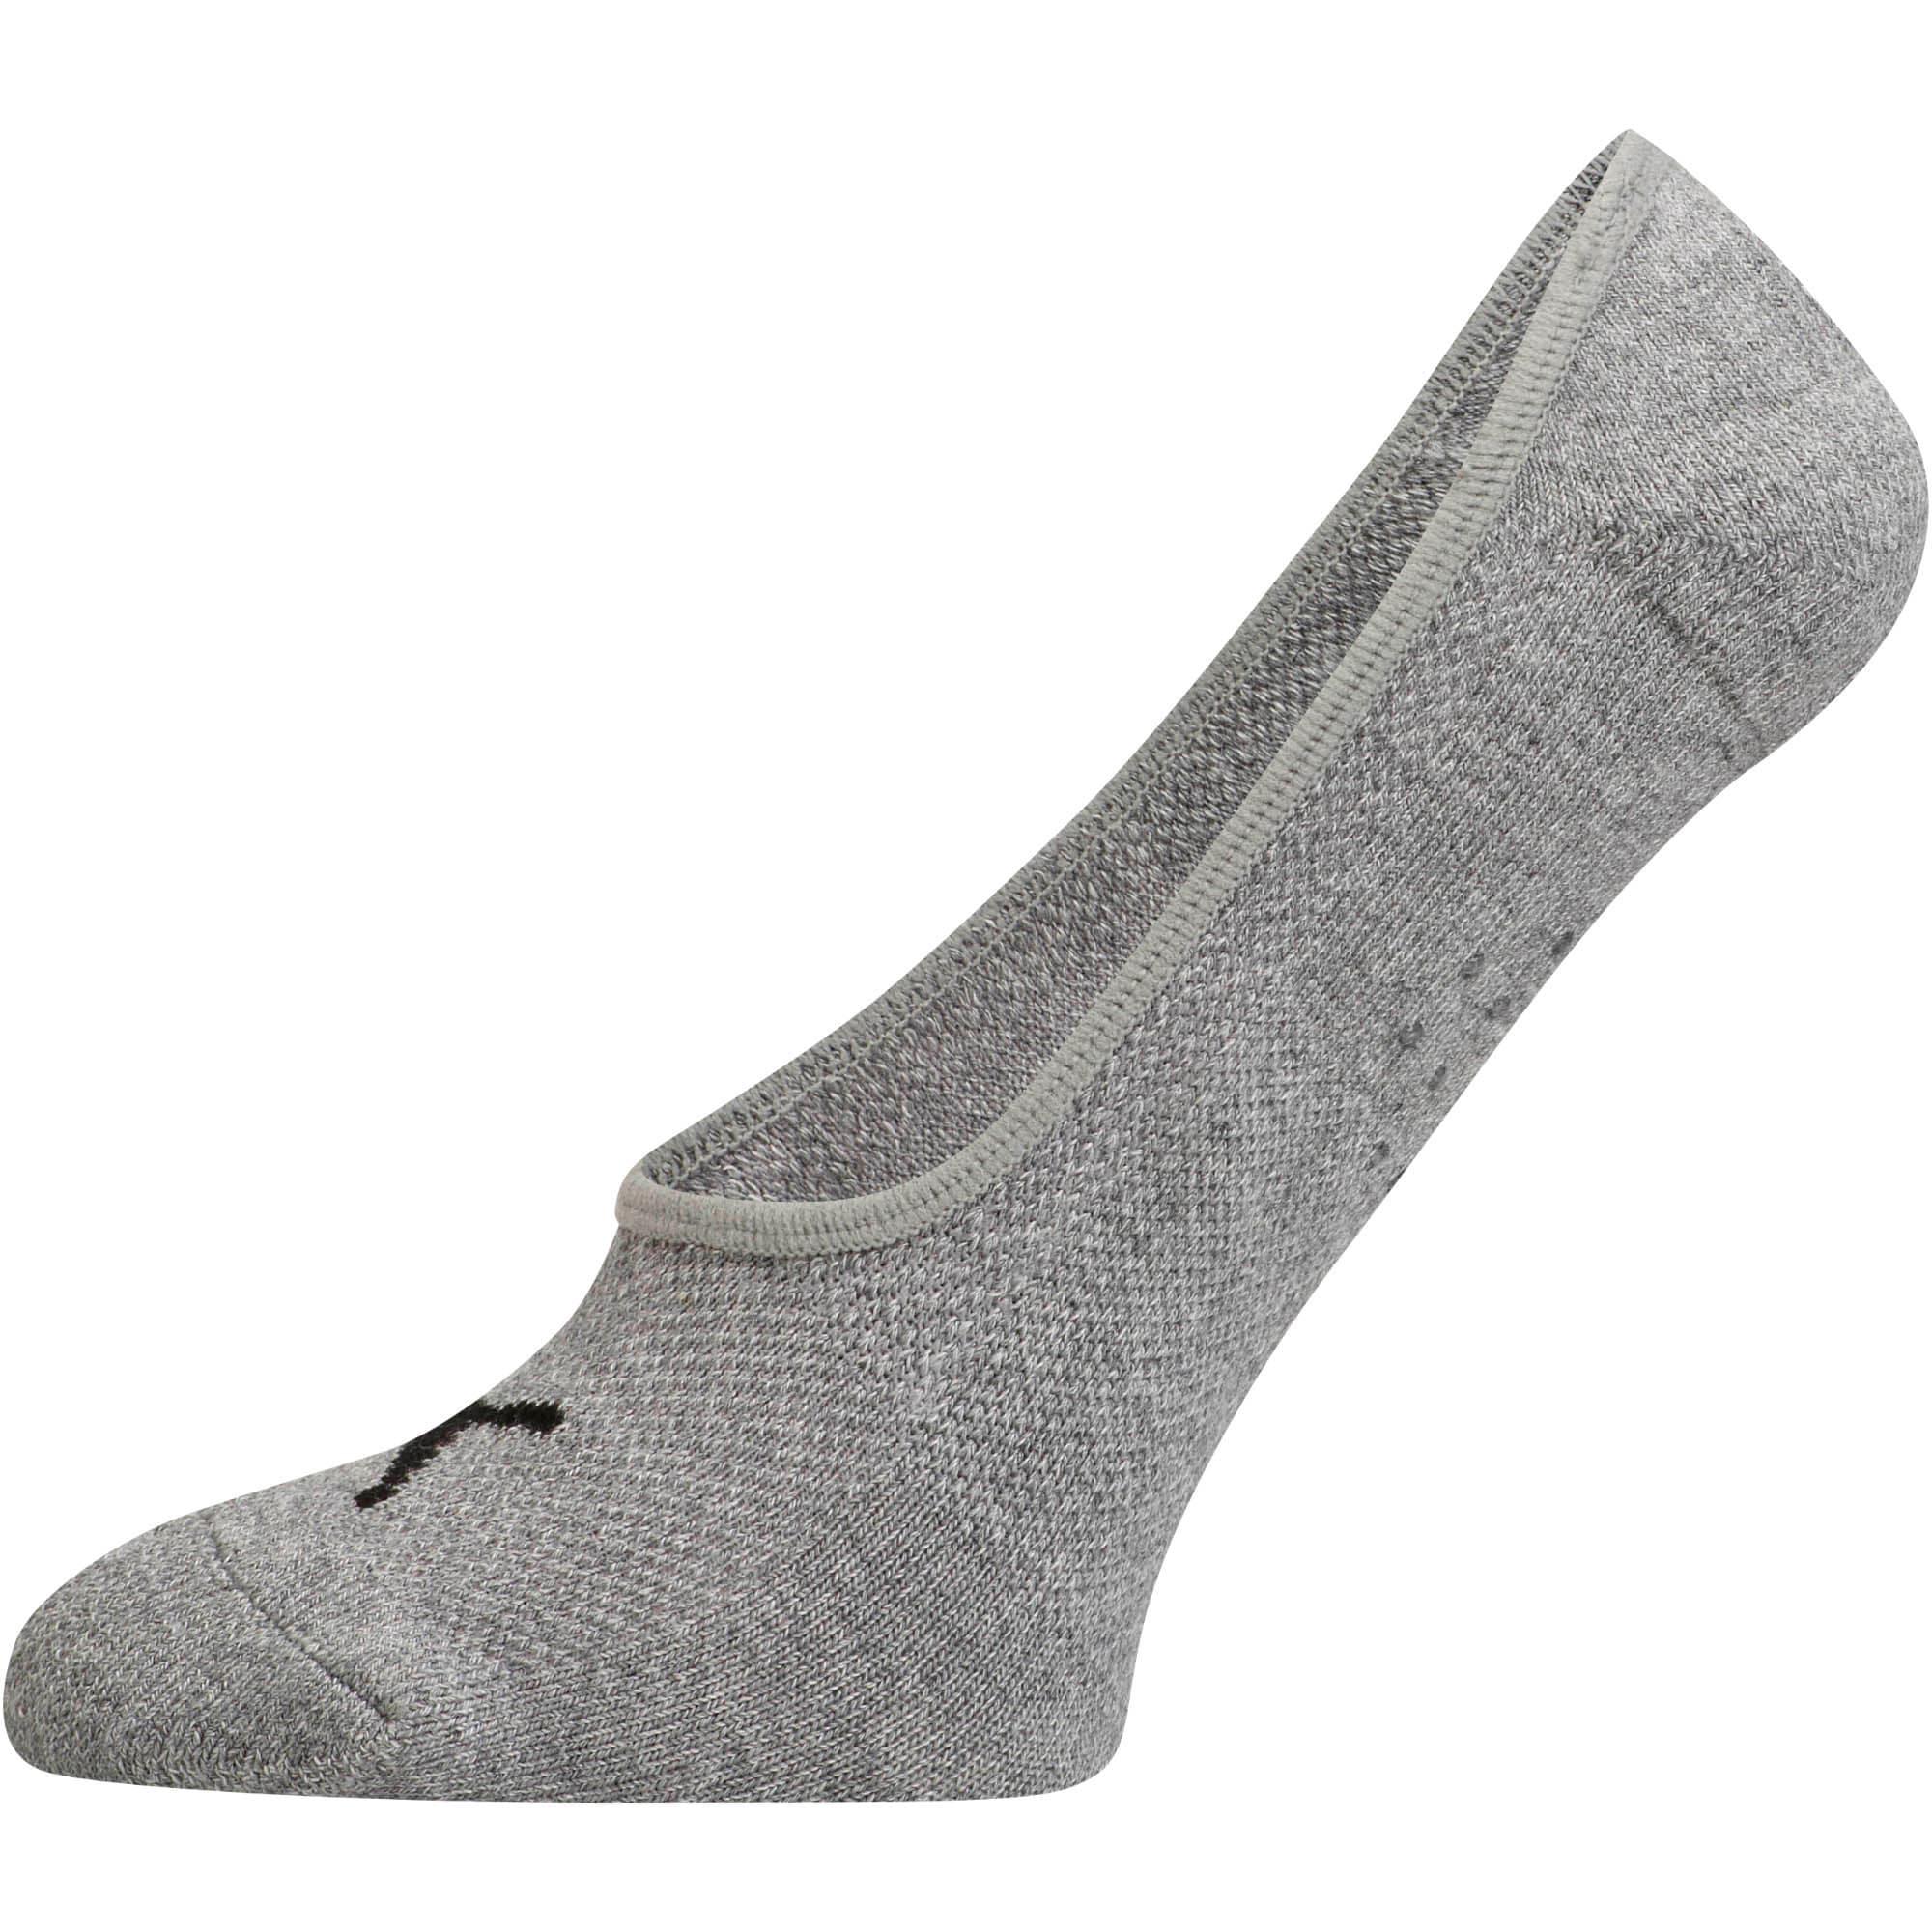 Thumbnail 4 of Women's Select Terry Liner Socks [3 Pack], GREY / PINK, medium